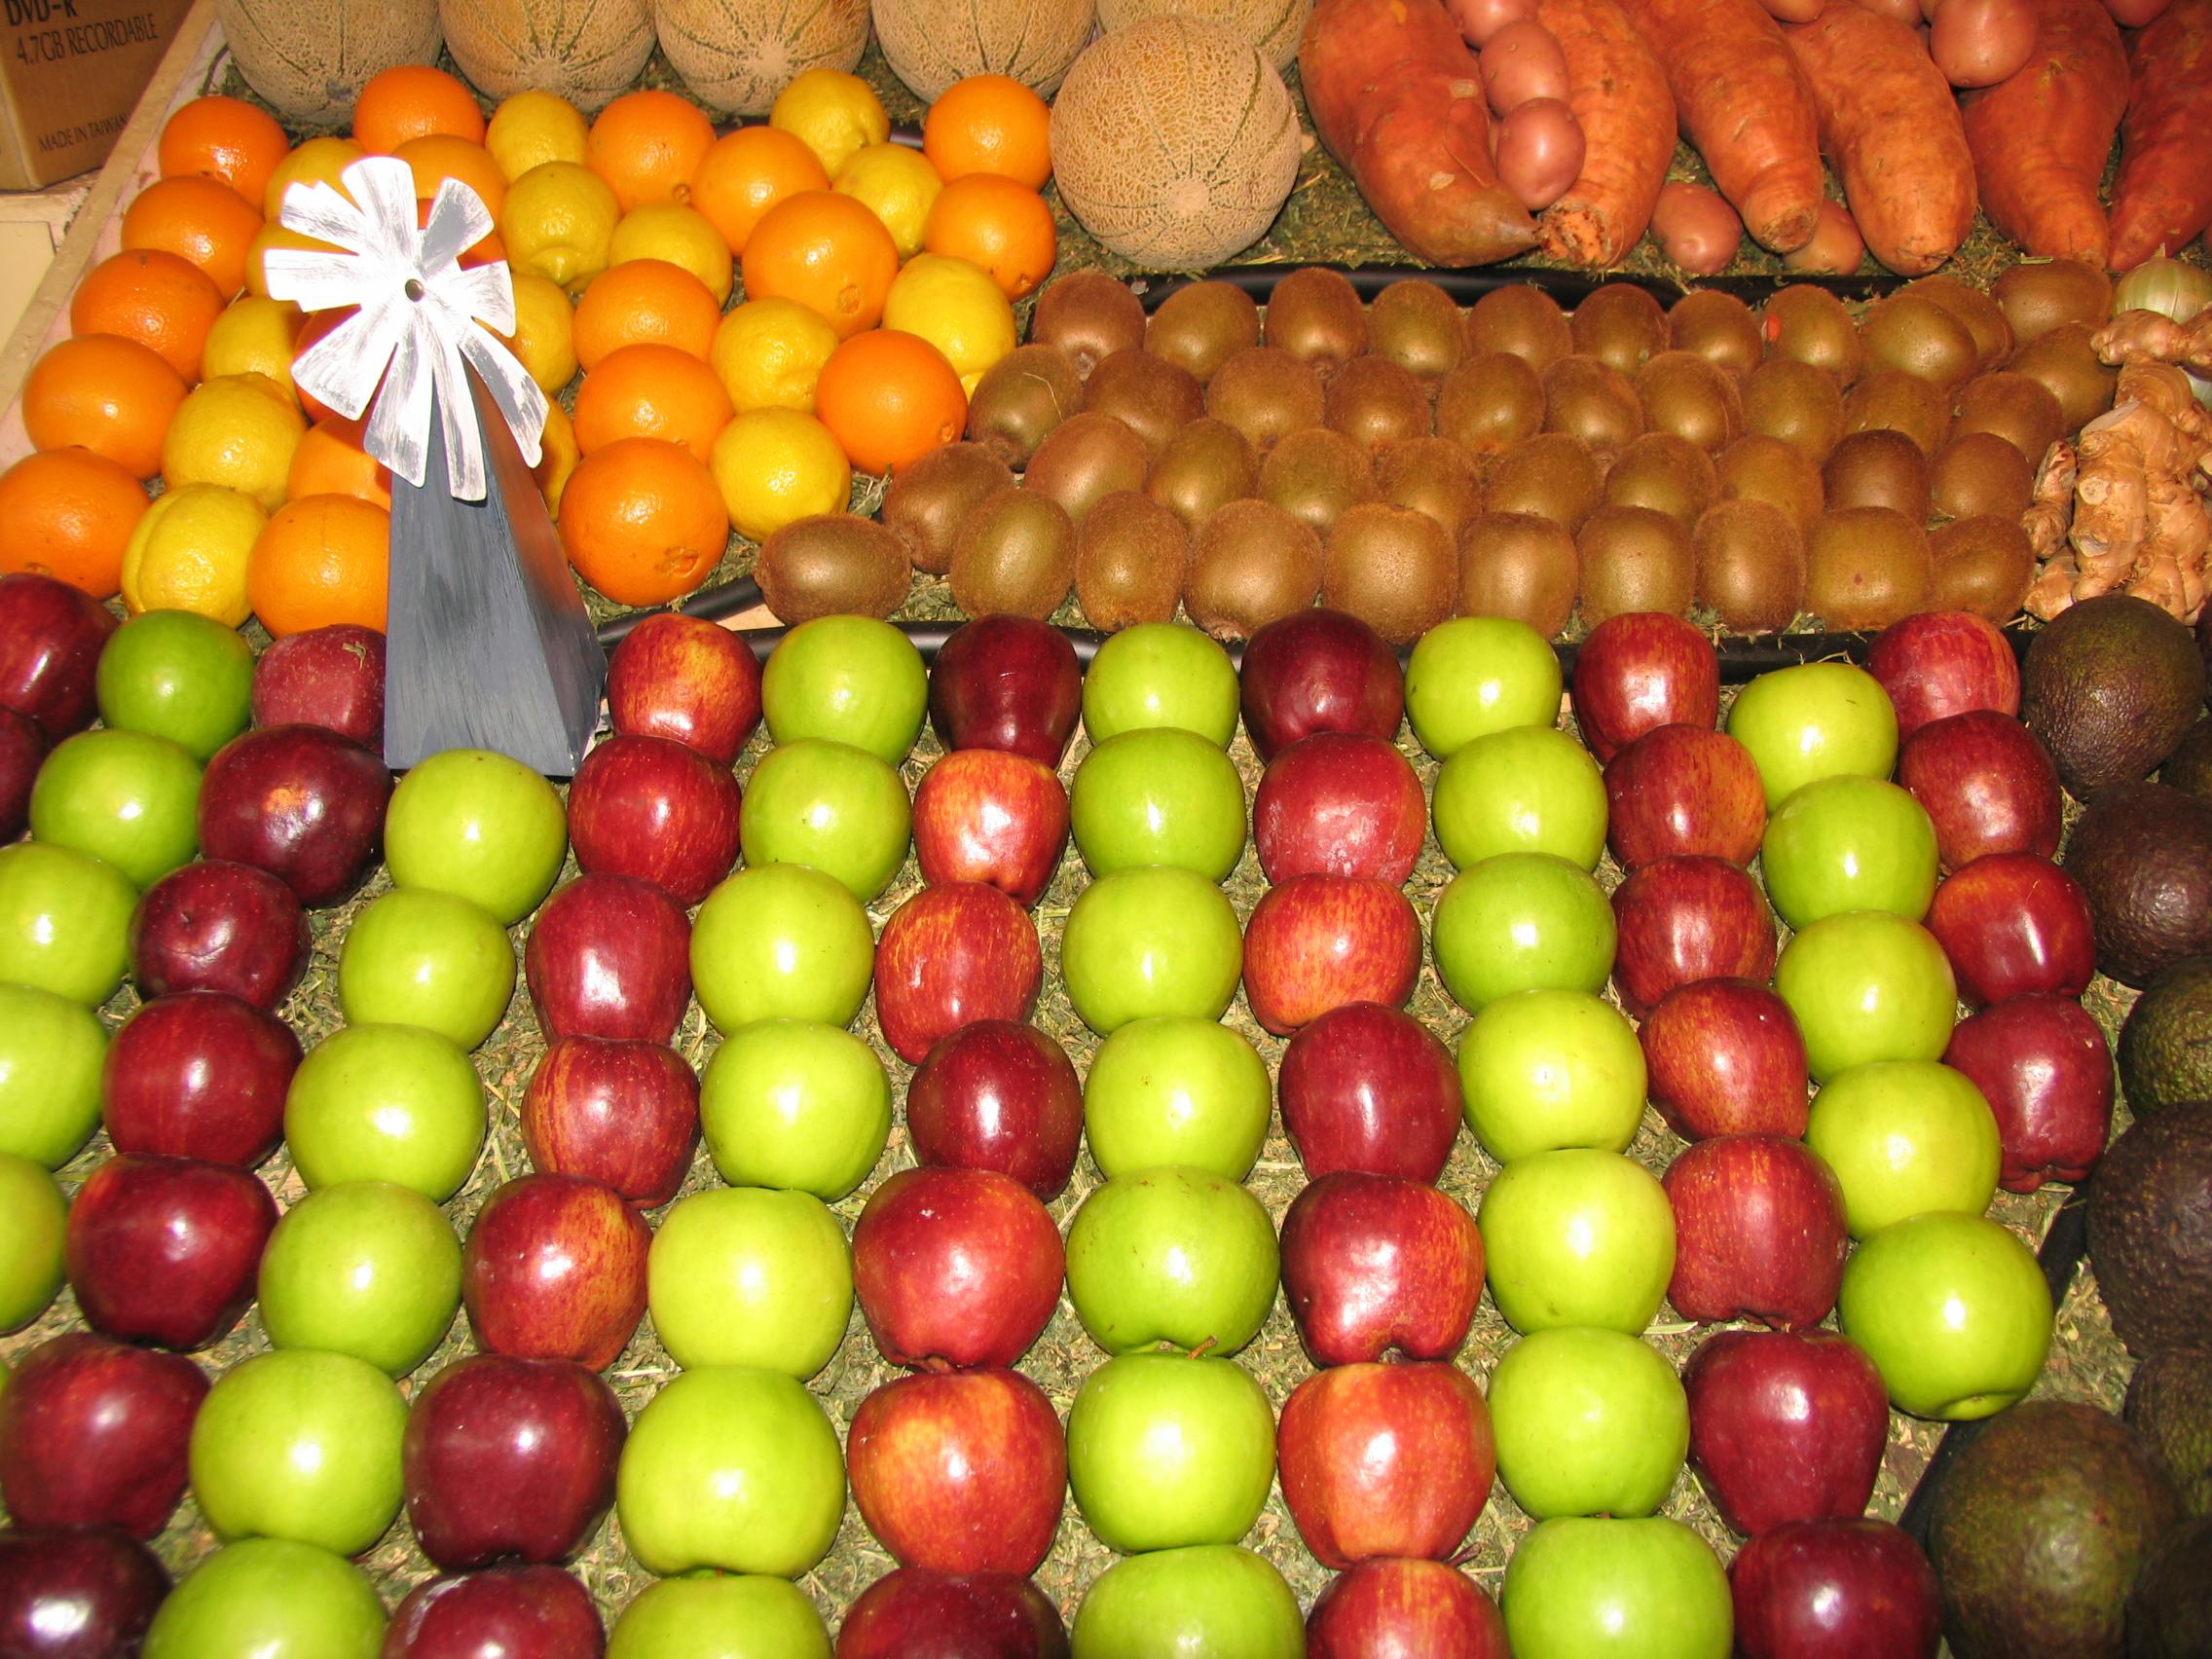 fruit and vege display